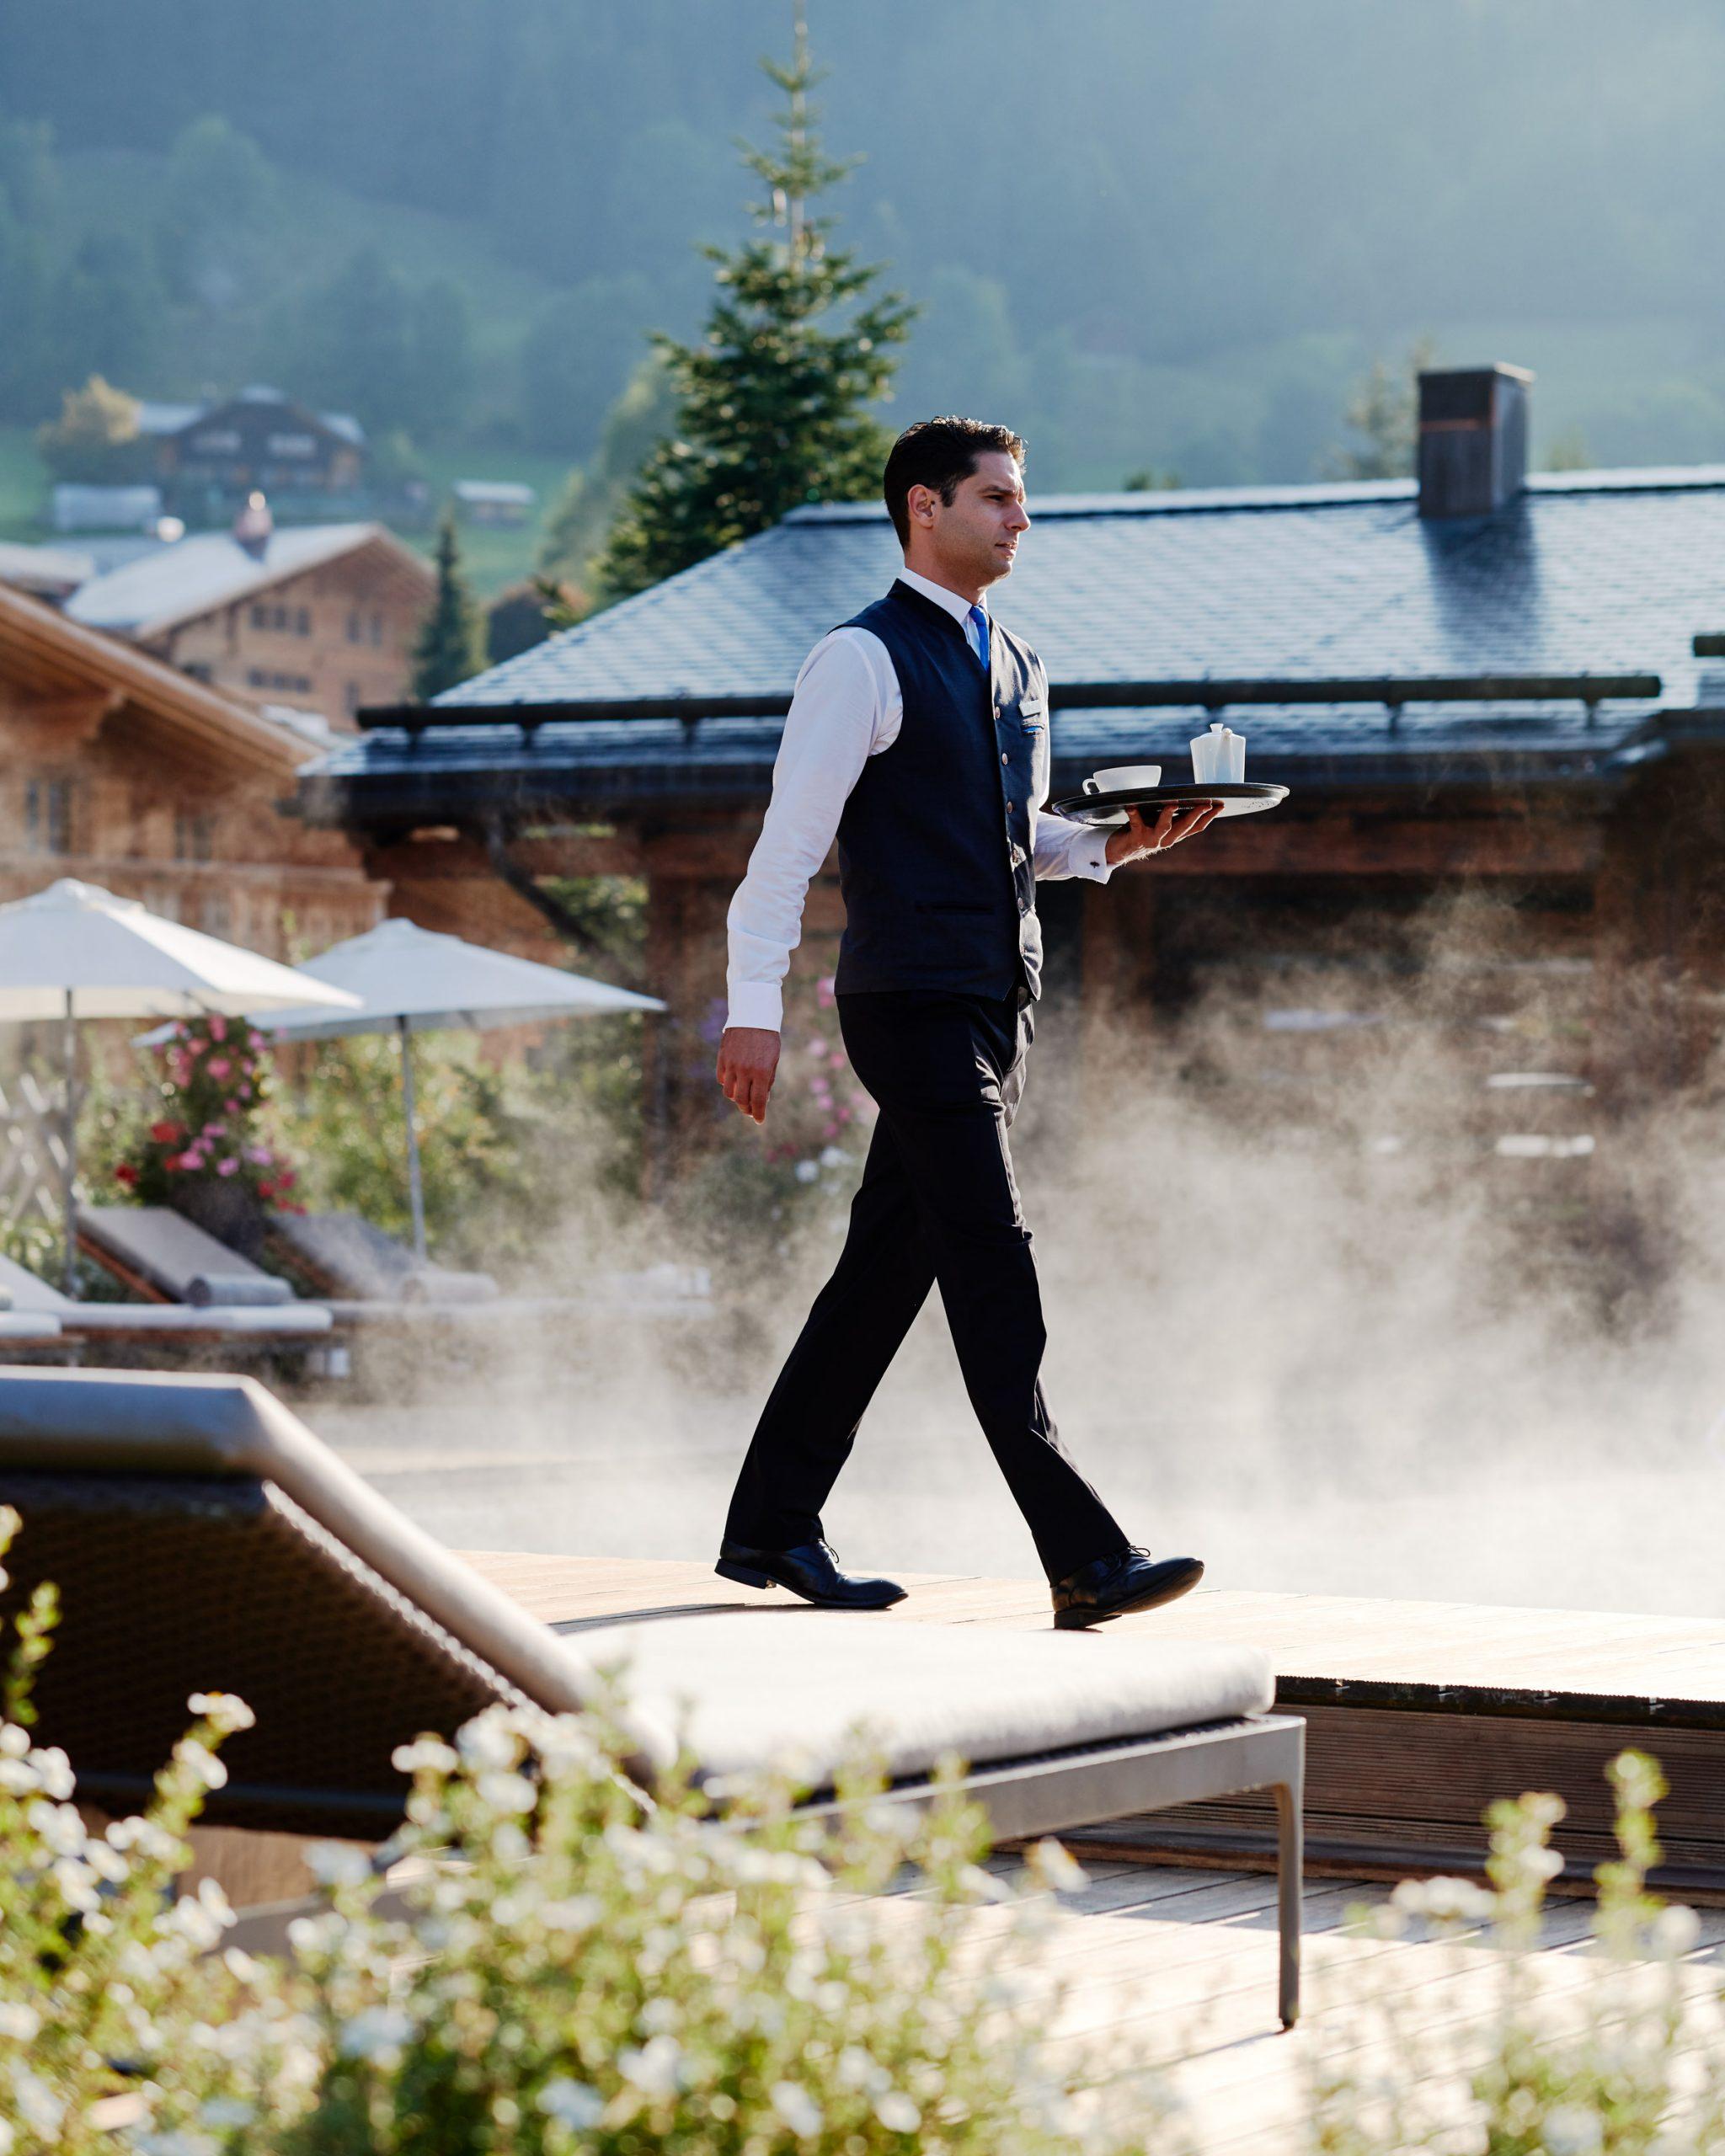 Pool service, Alpina Gstaad Hotel